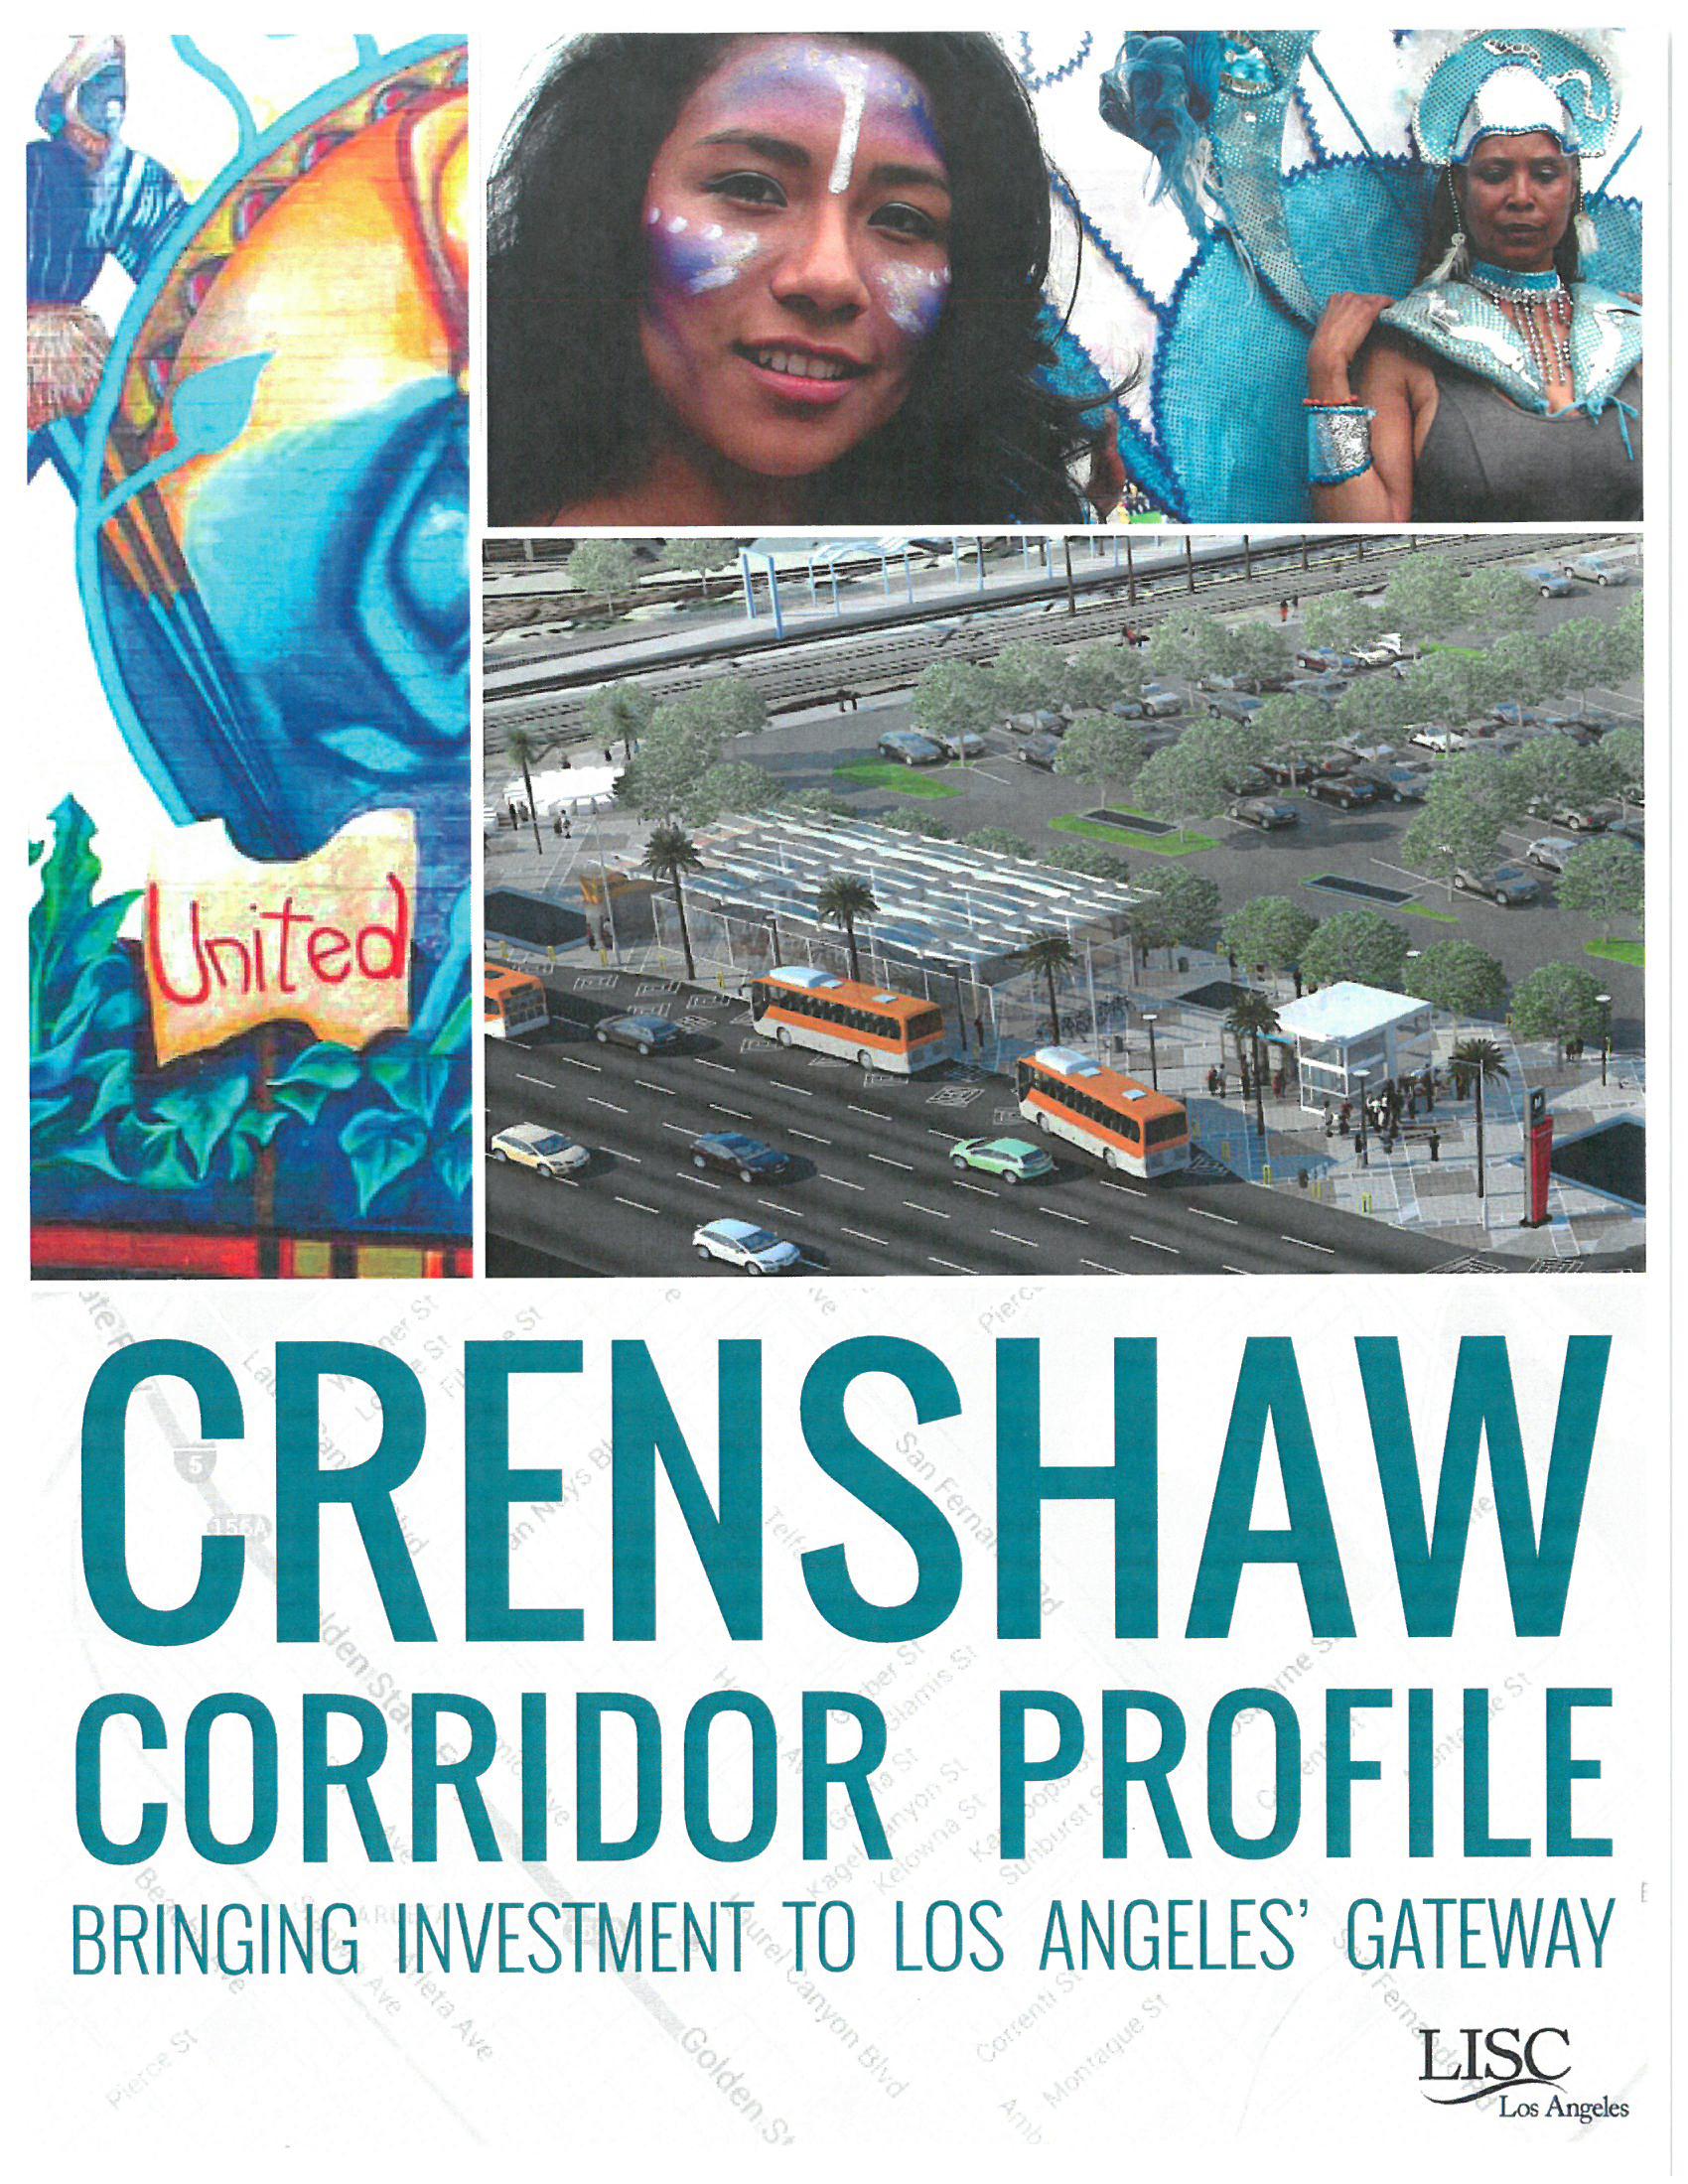 Crenshaw_Corridor_Profile.png